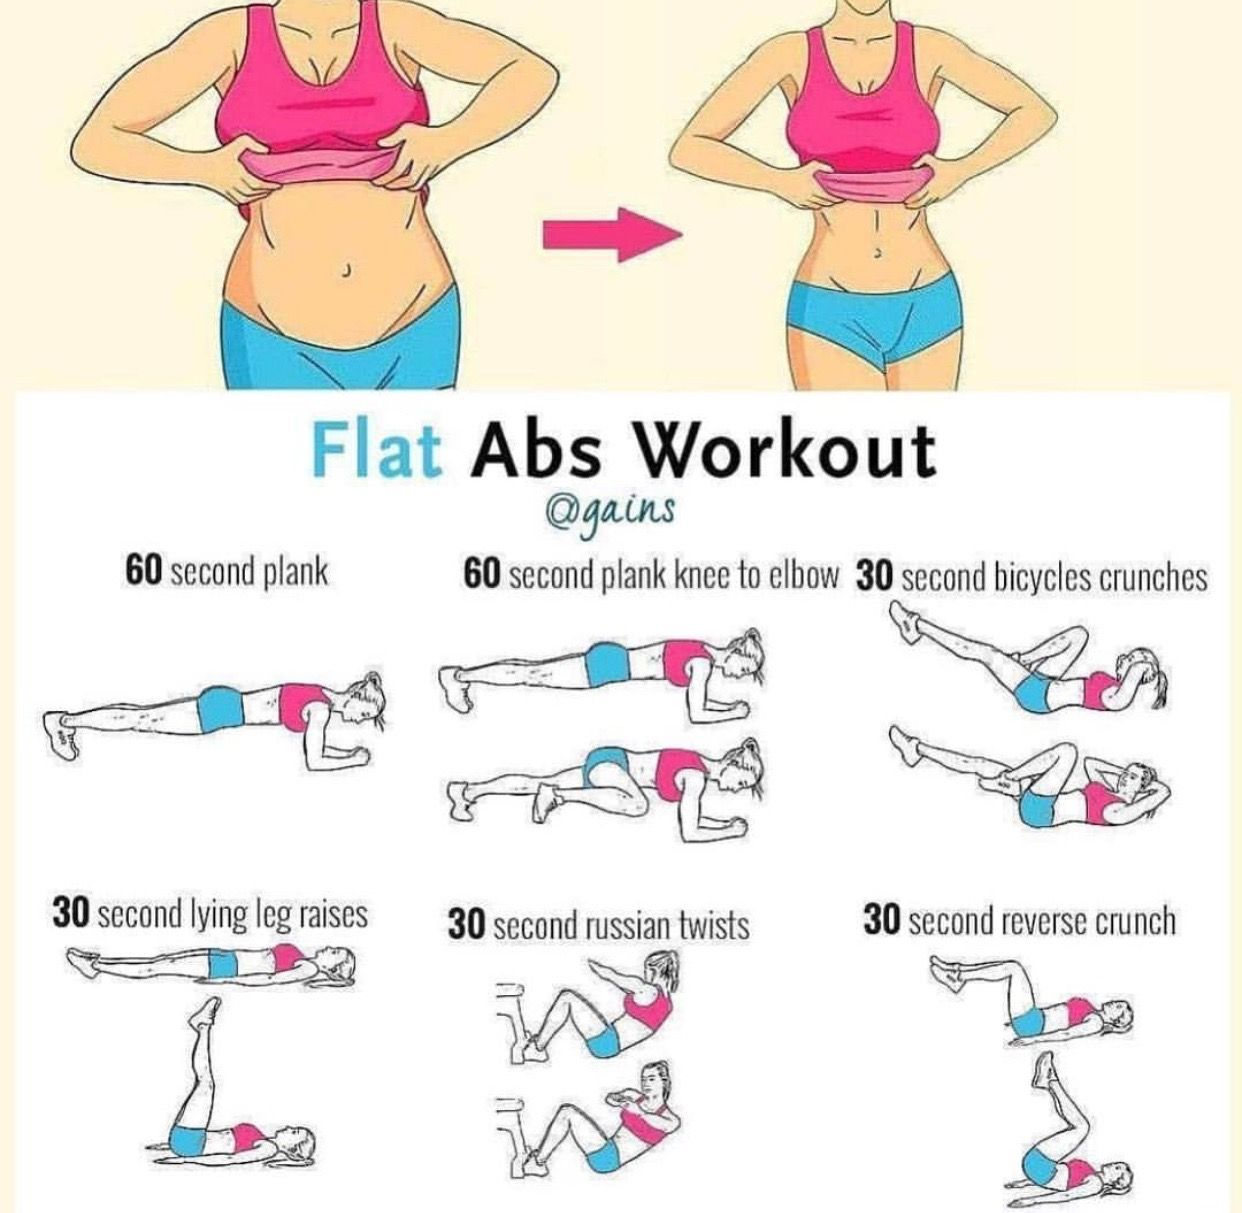 Flat ab | Flat abs workout, Abs workout, Workout